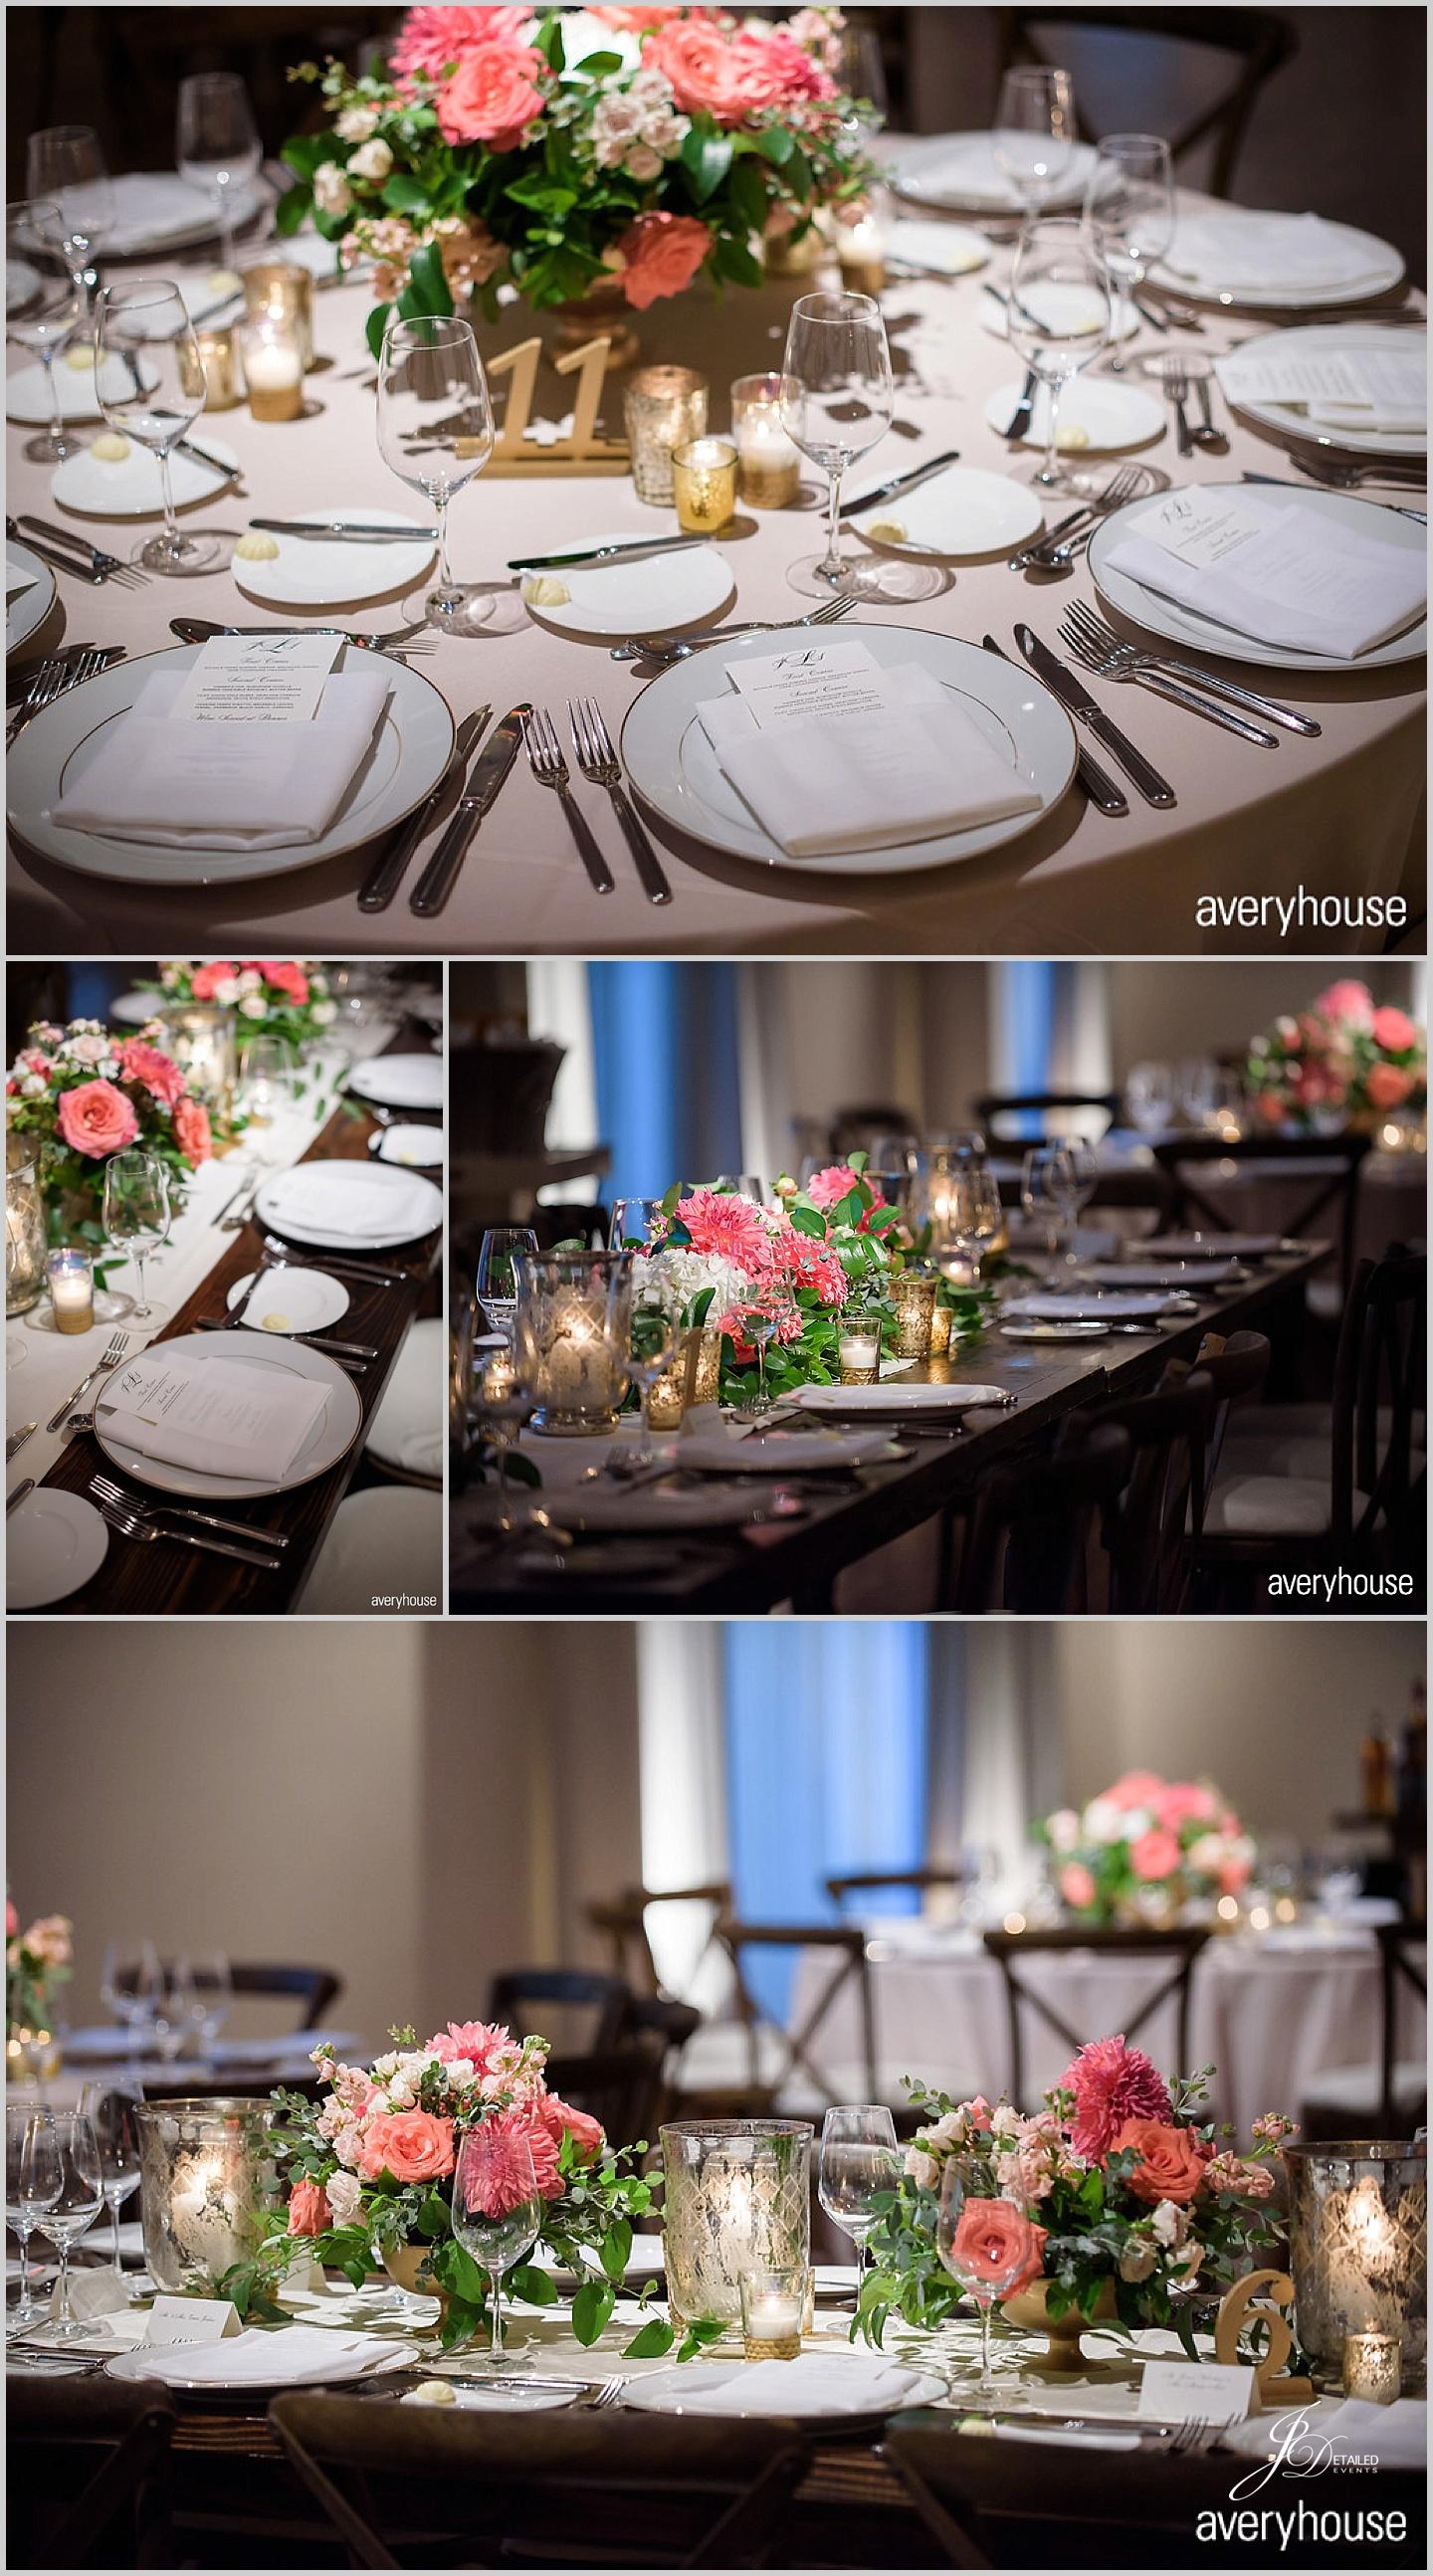 avery-house-wedding-chicago_2228